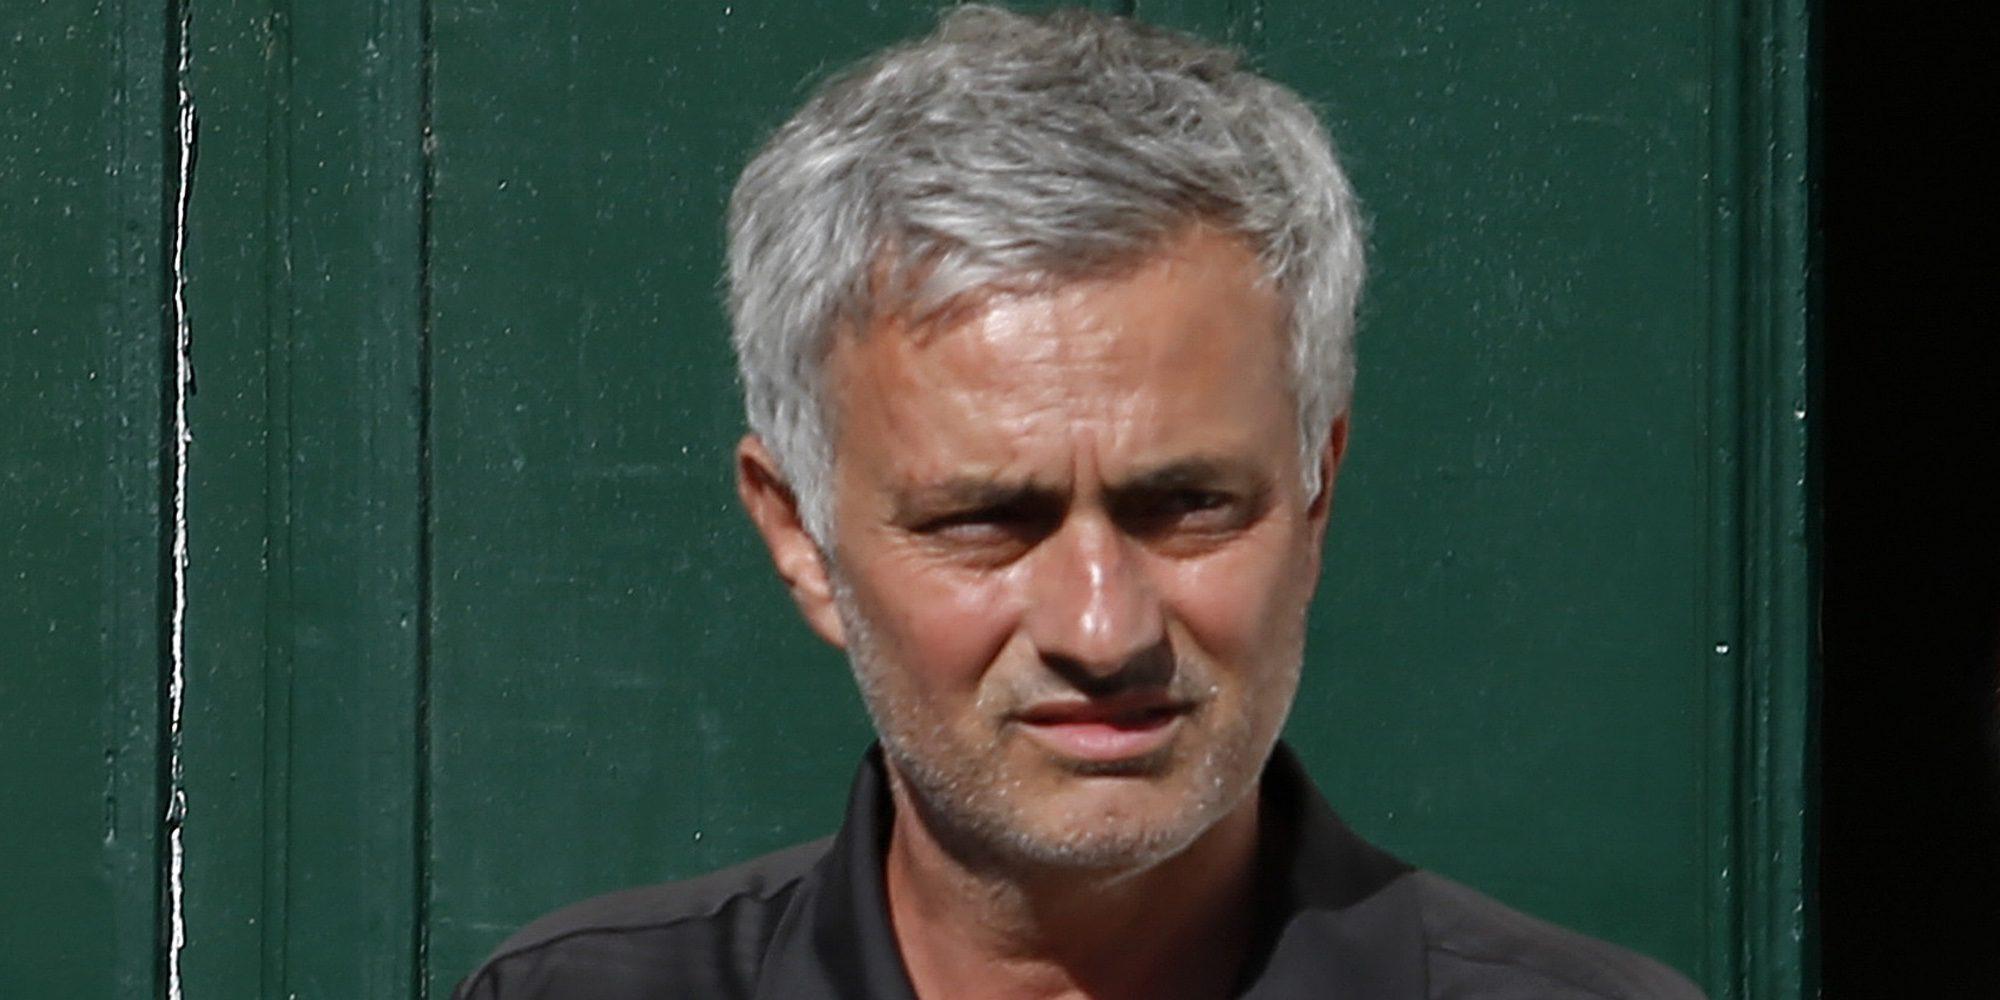 José Mourinho, desolado tras la muerte de su padre